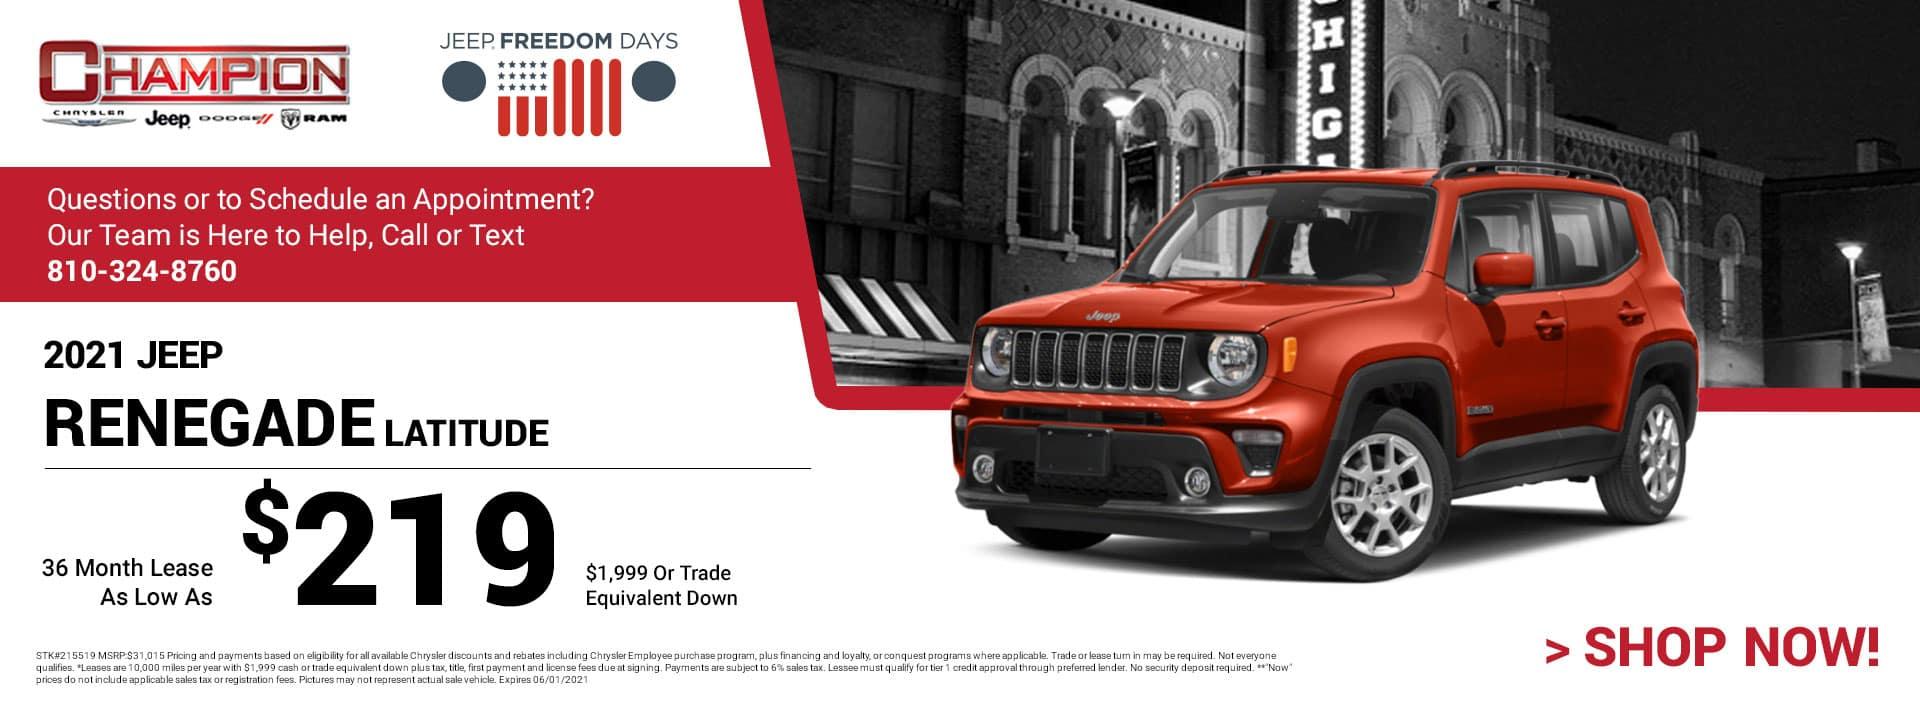 2021 Jeep Renegade Latitude 215519 $31,015 $1,999 or Trade Equivalent Down 36 $219